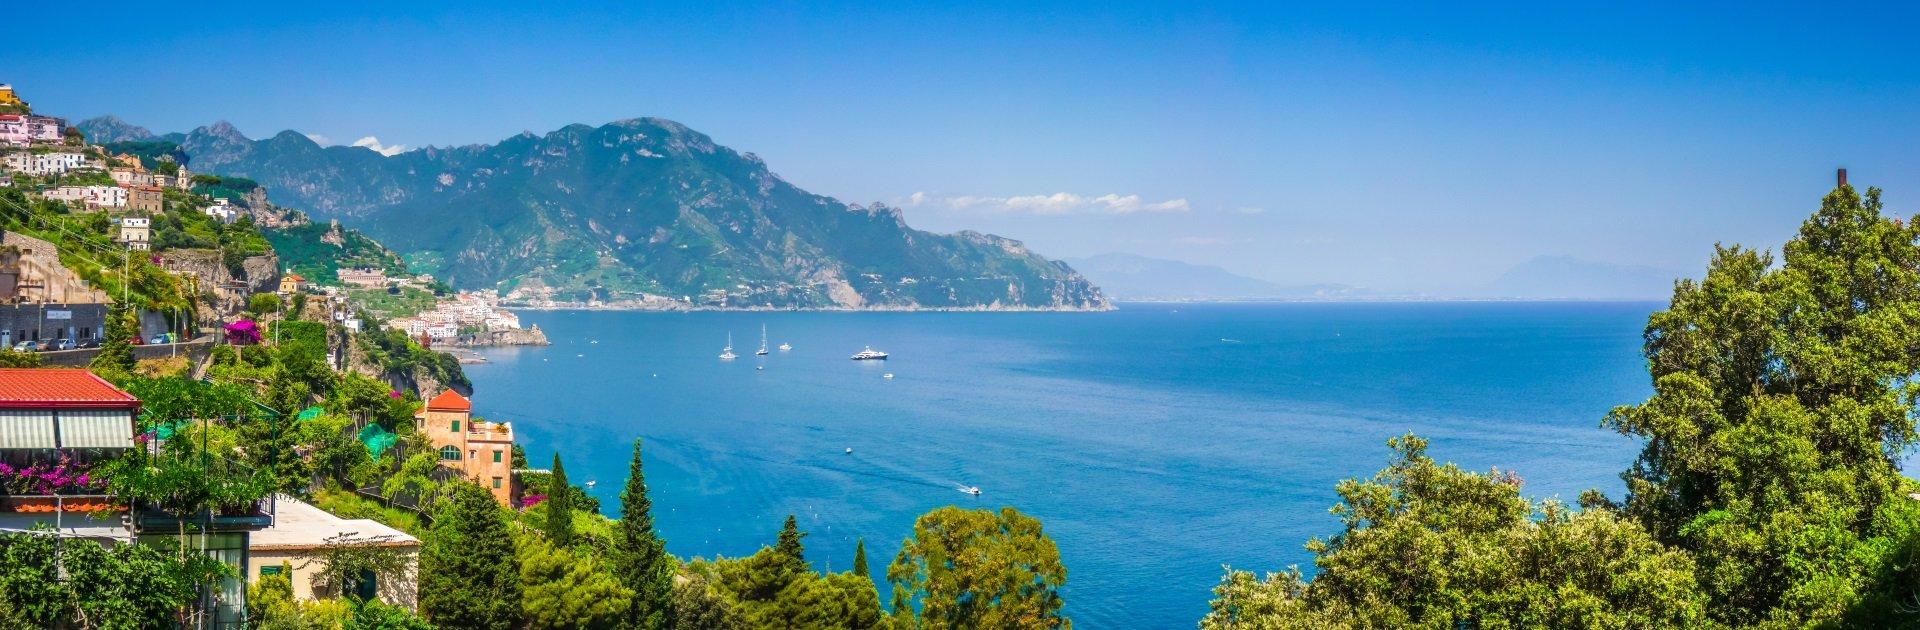 Ferienunterkünfte in Italien